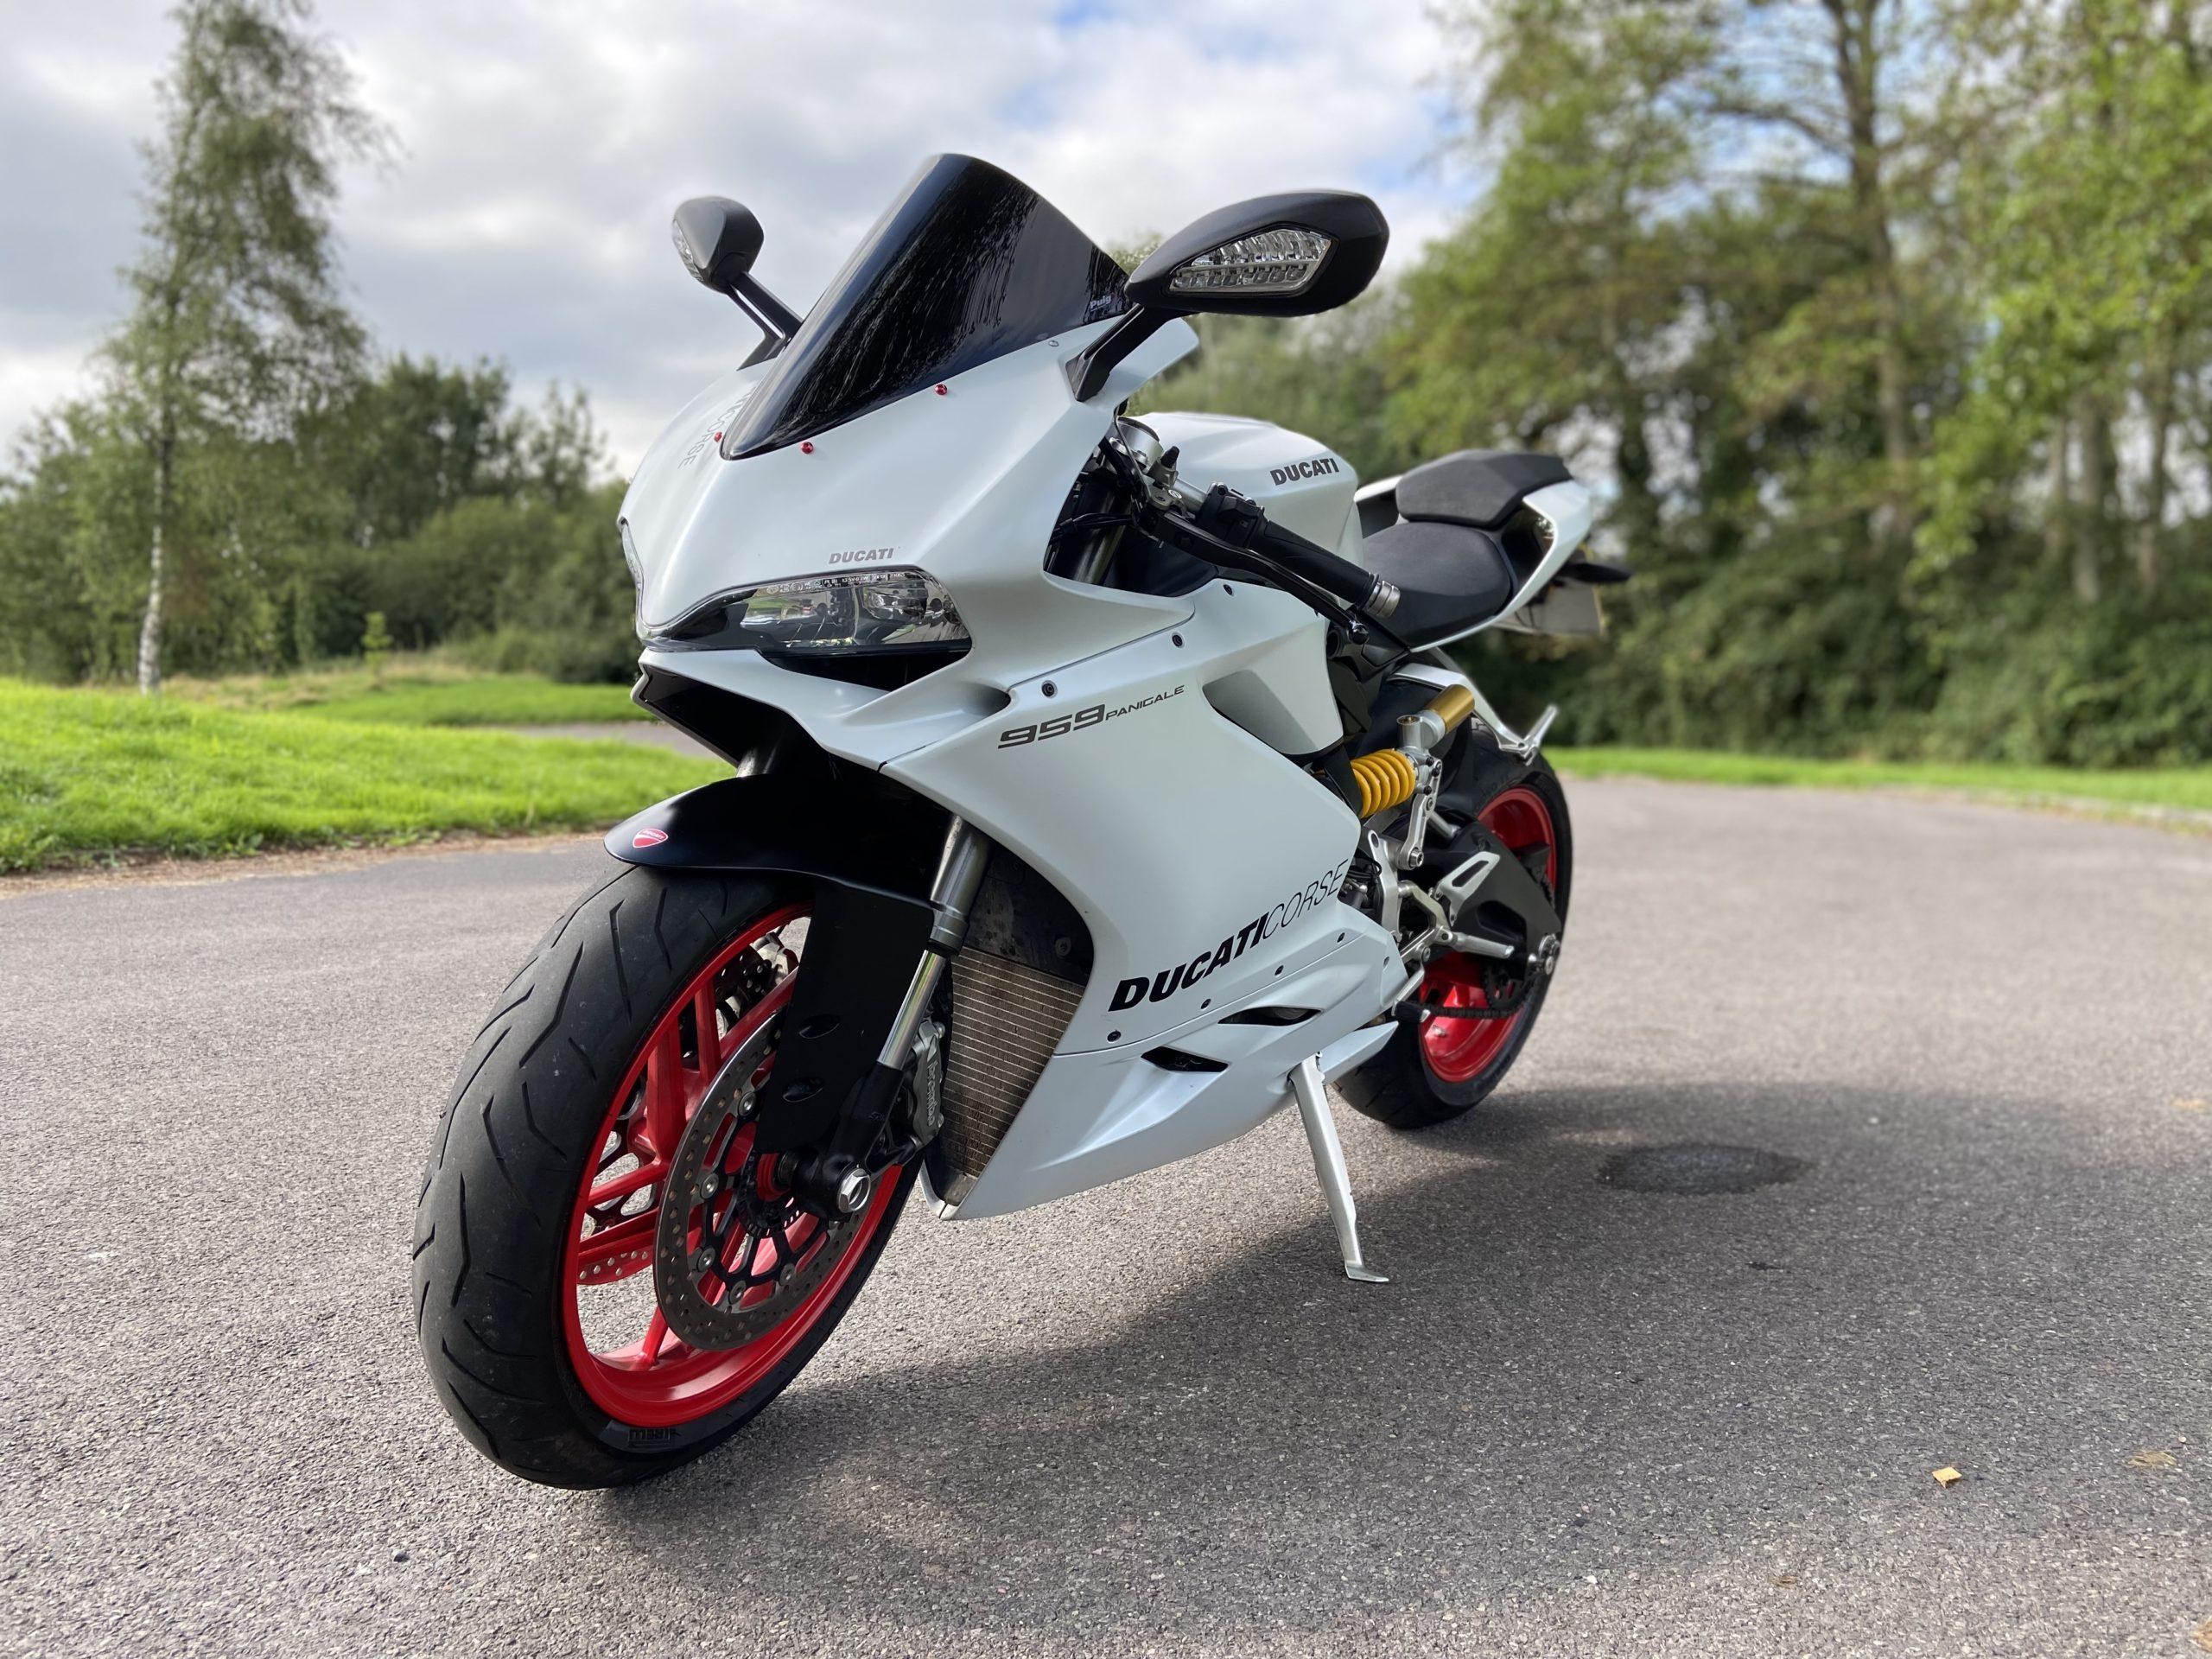 Ducati 959 Panigale - 30th Aug